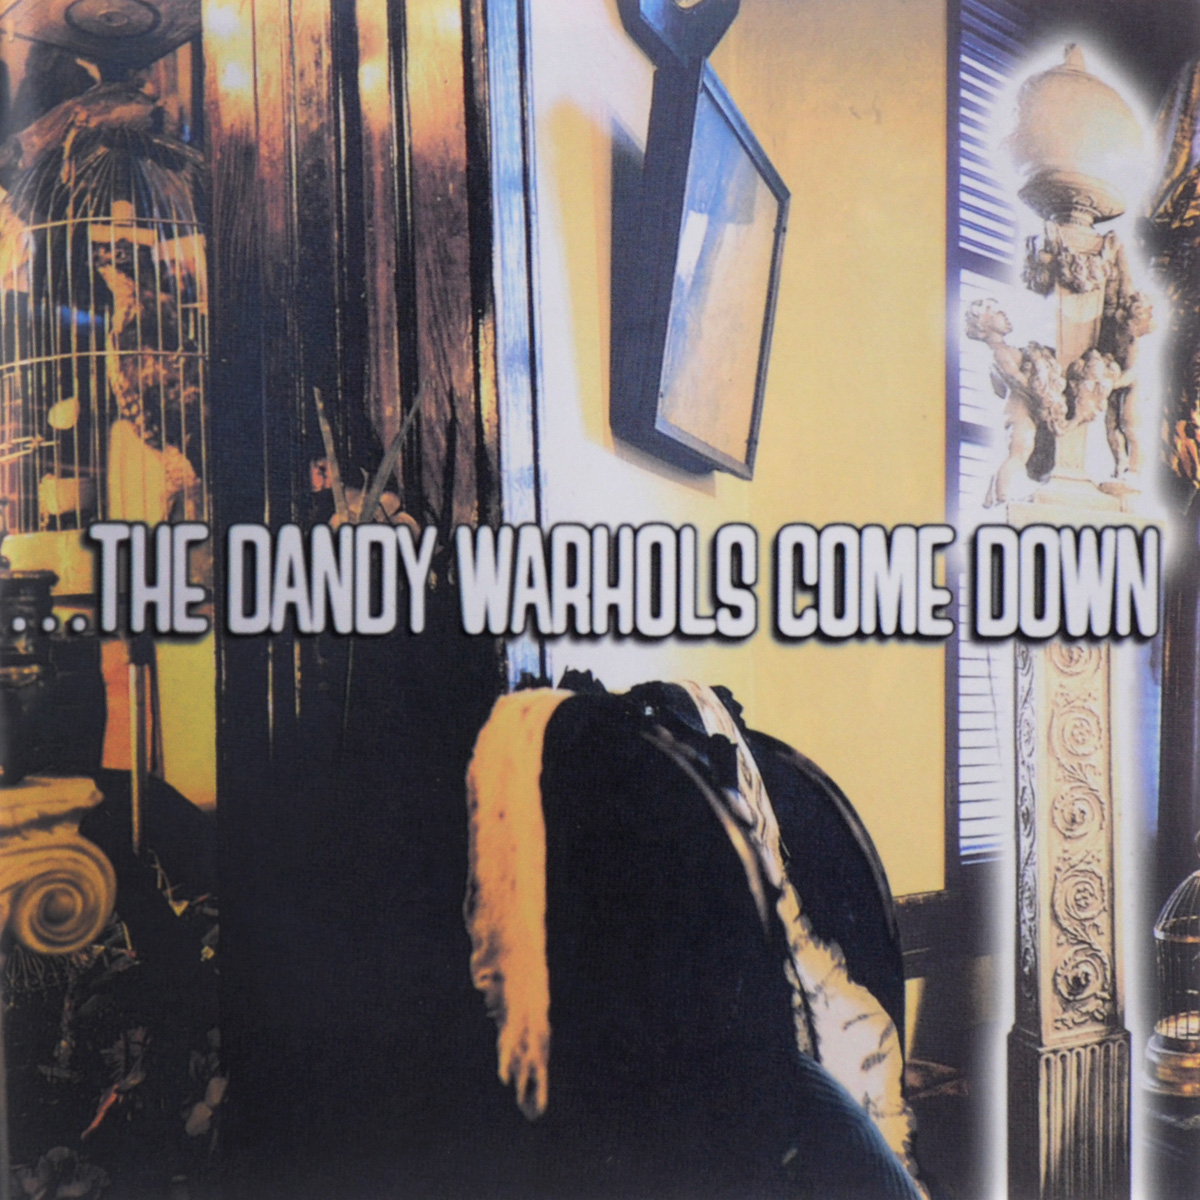 The Dandy Warhols The Dandy Warhols. The Dandy Warhols Come Down tatkraft dandy